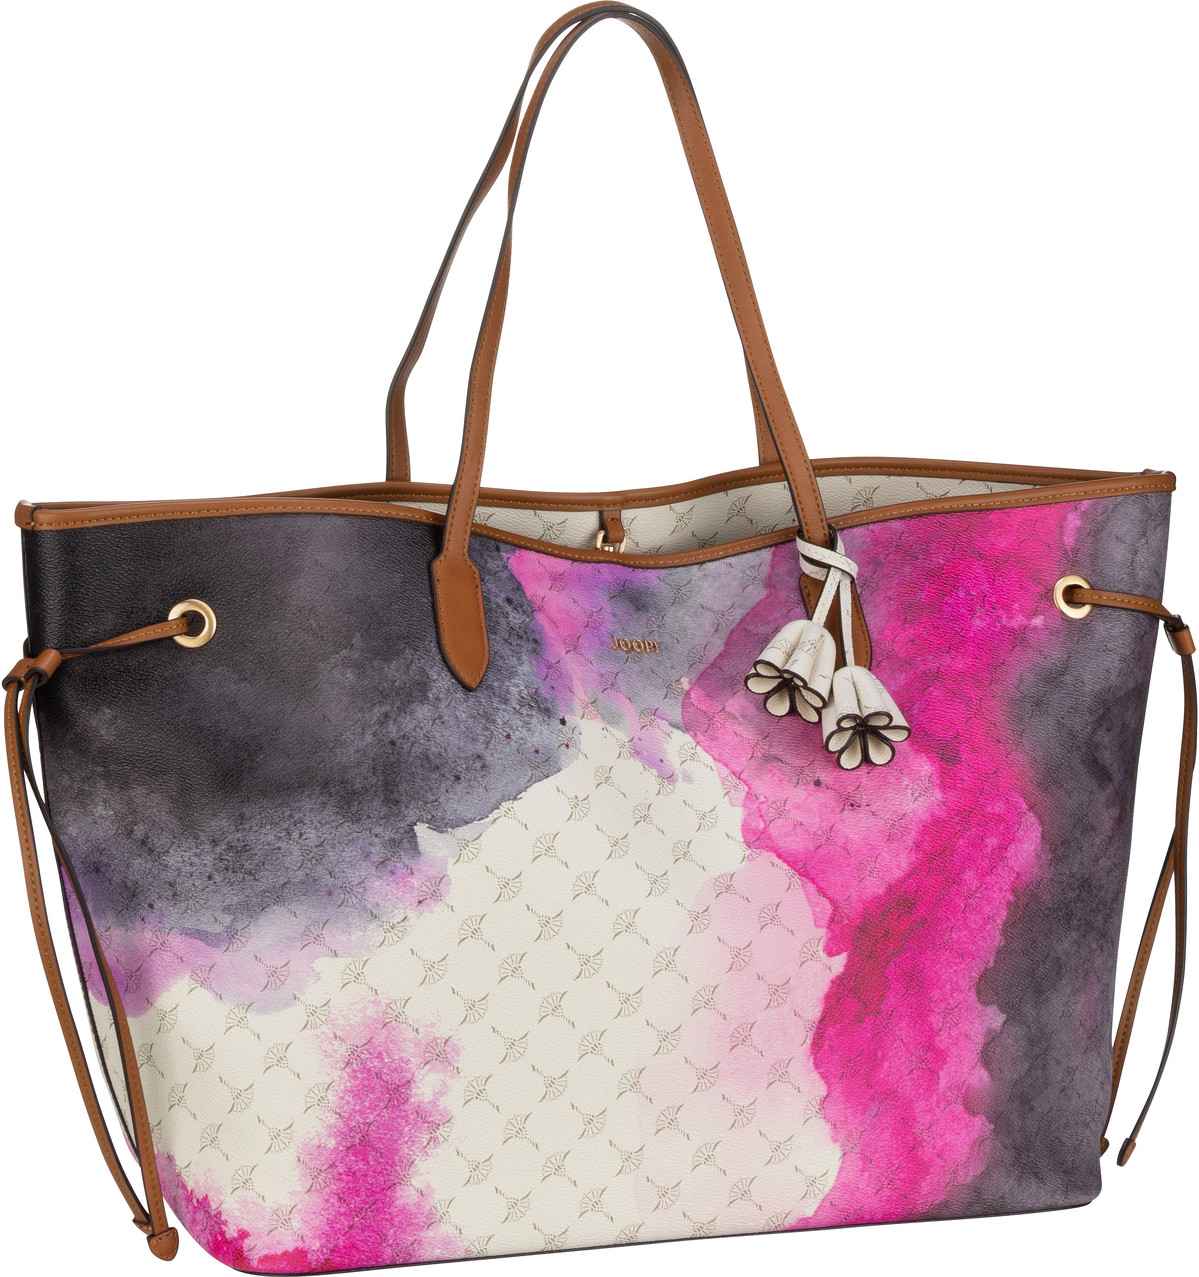 joop -  Handtasche Cortina Fresco Lara Shopper XLHO Pink